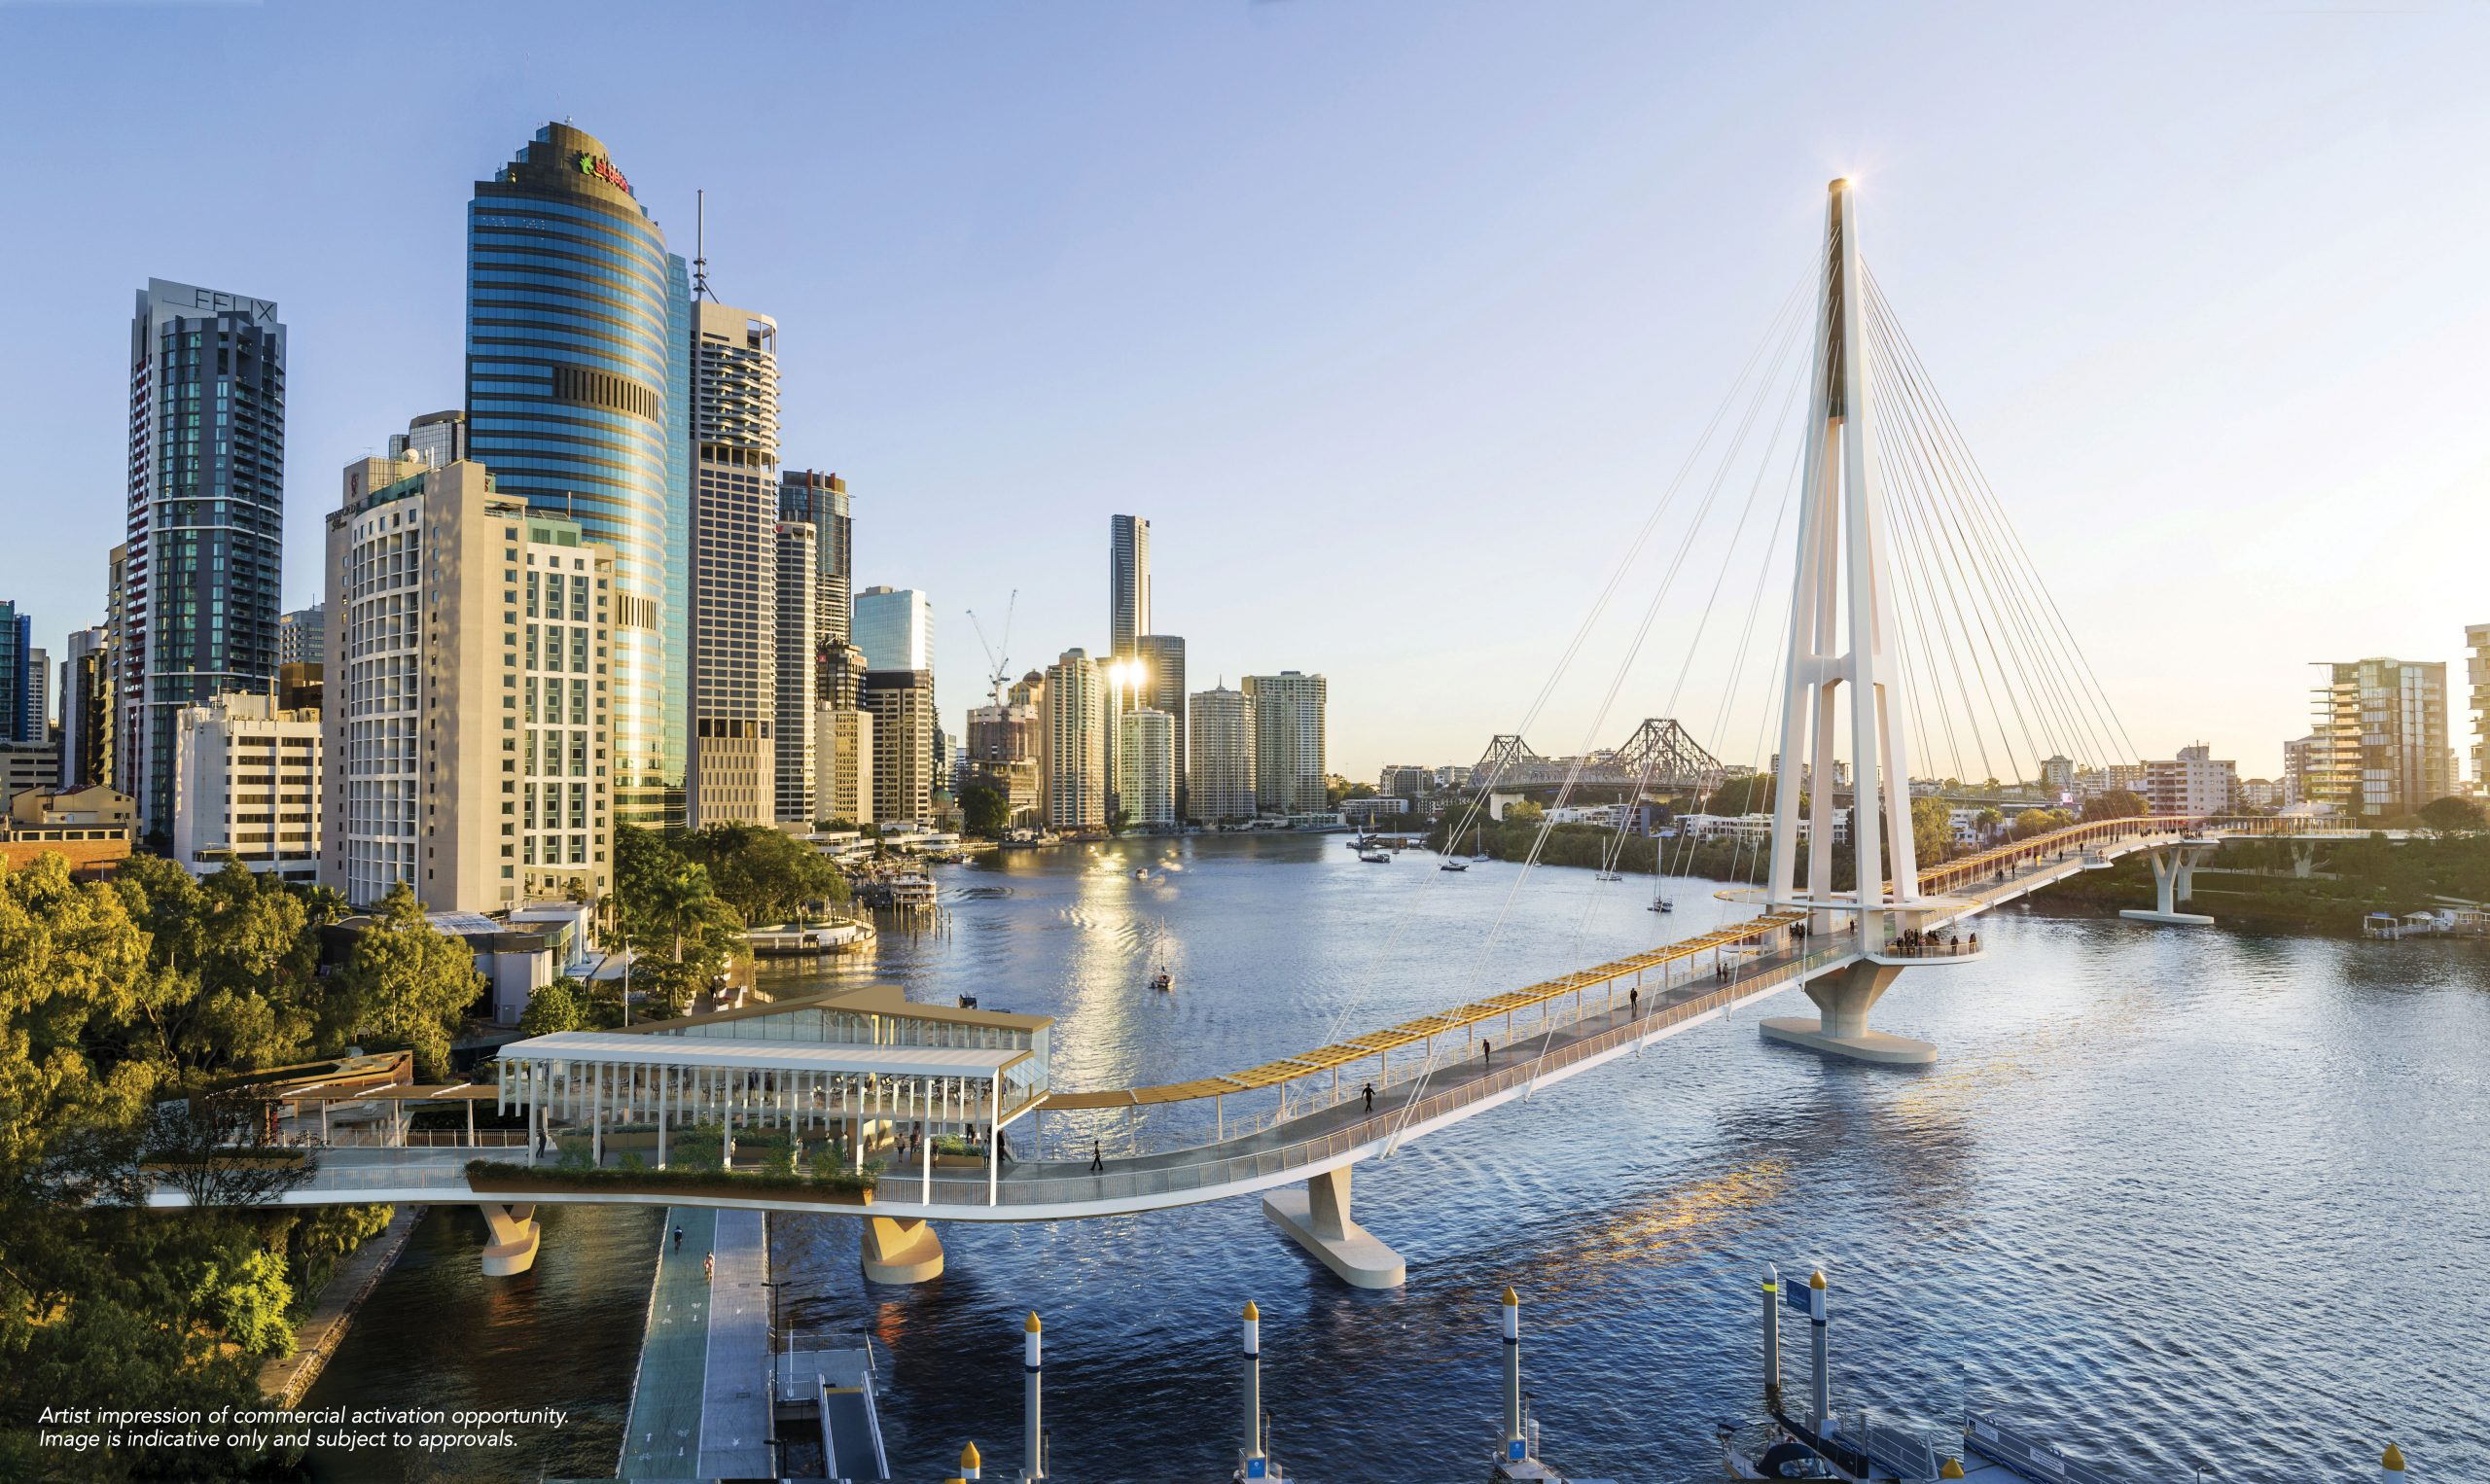 City - Kangaroo Point Green Bridge